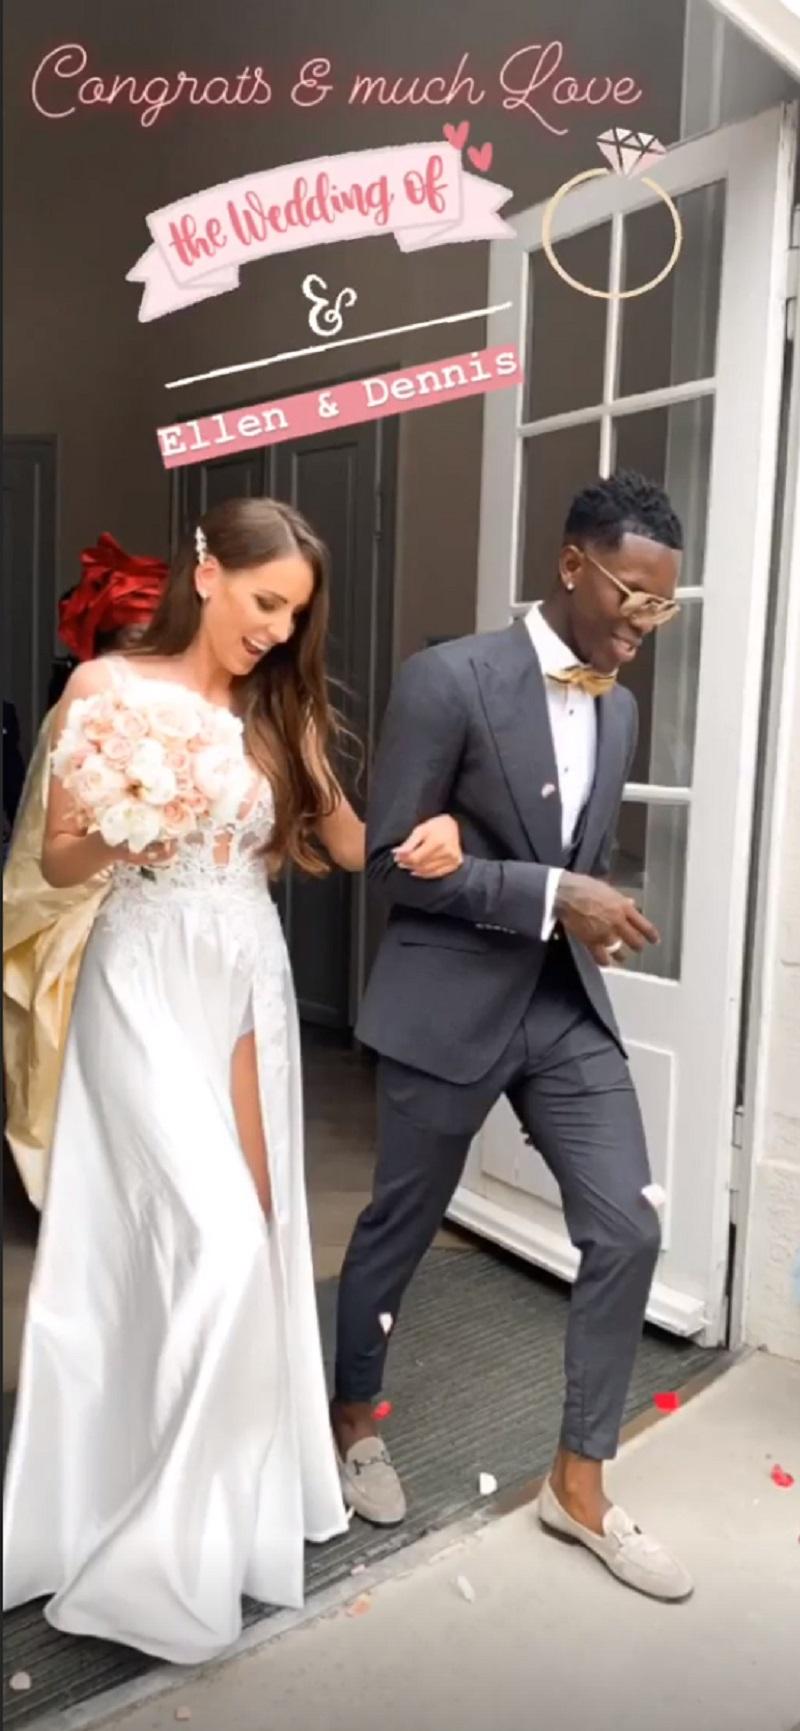 Germany Panties Blitzer At Schroeder S Wedding Nba Star Marries Bride In Darling Dress